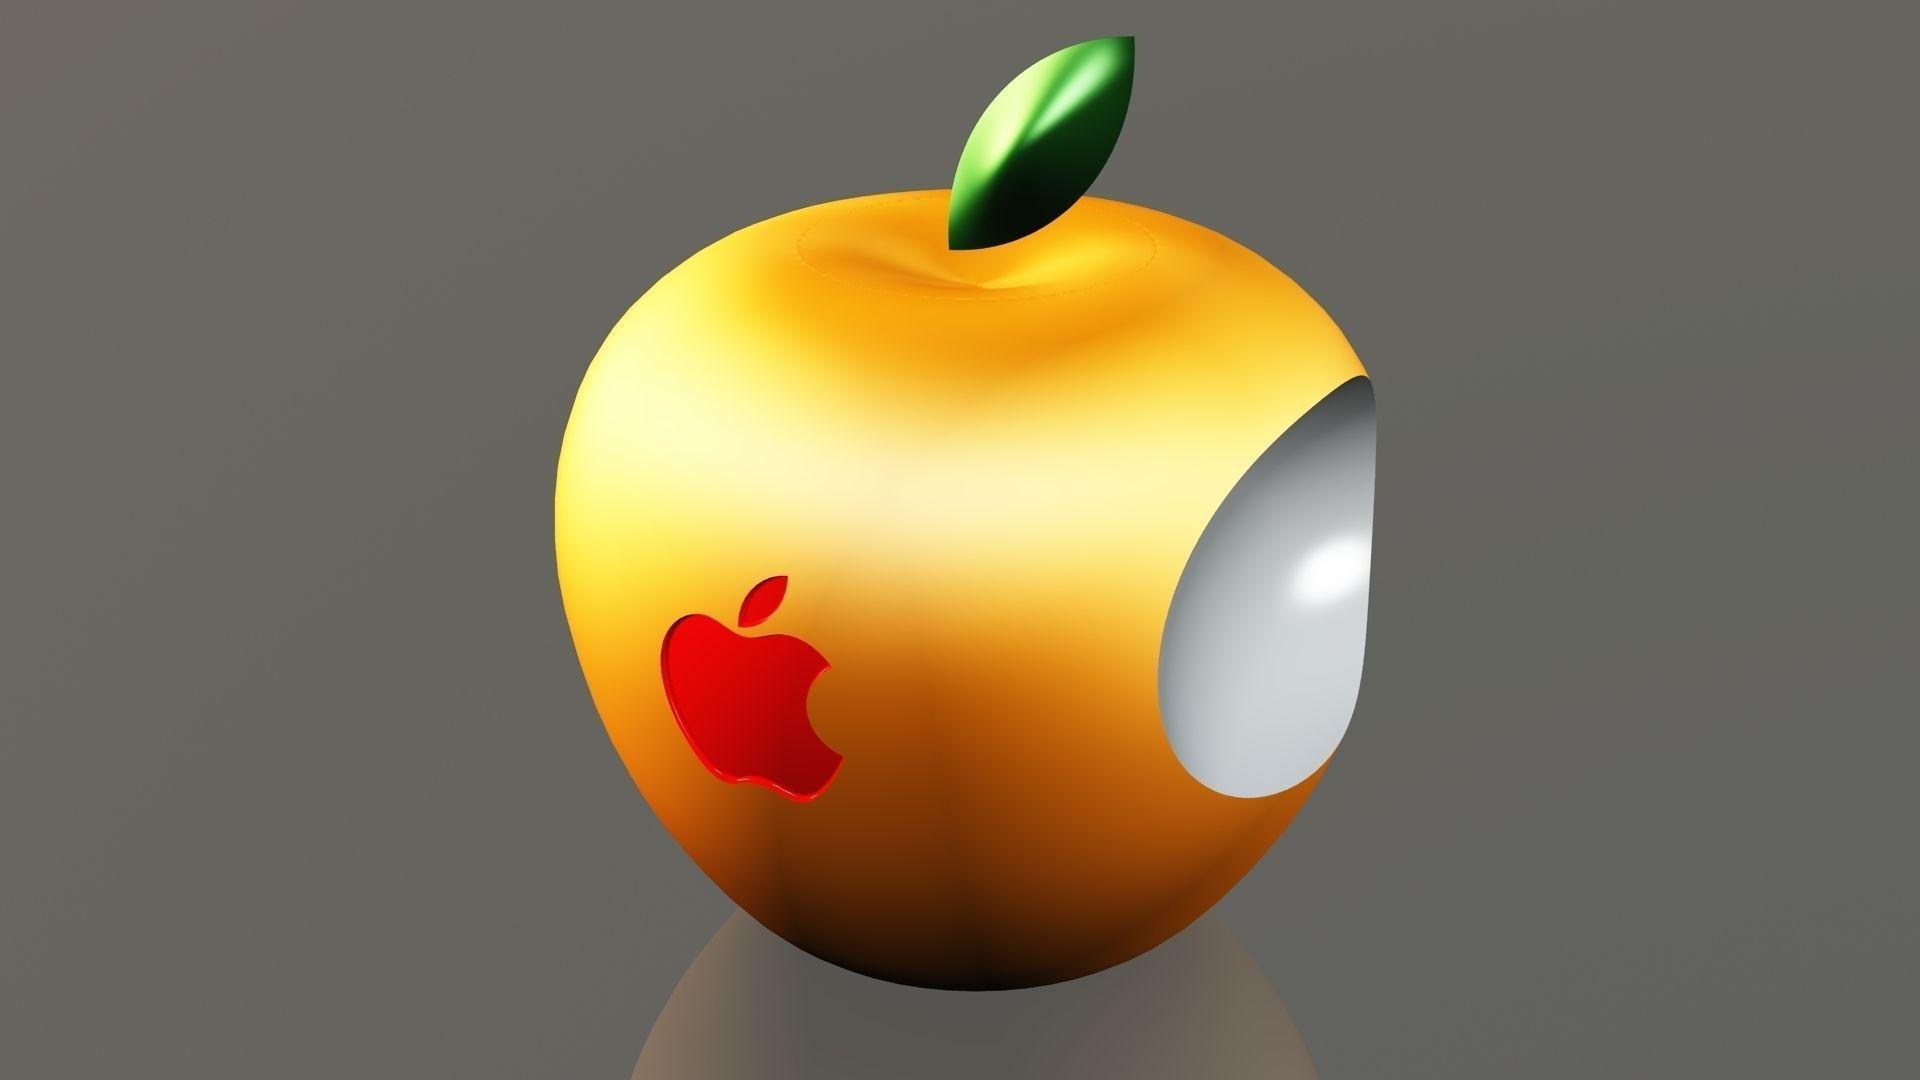 3D Apple Logo free 3D Model 3D printable .stl .dwg .sldprt .sldasm .slddrw .ige .igs .iges